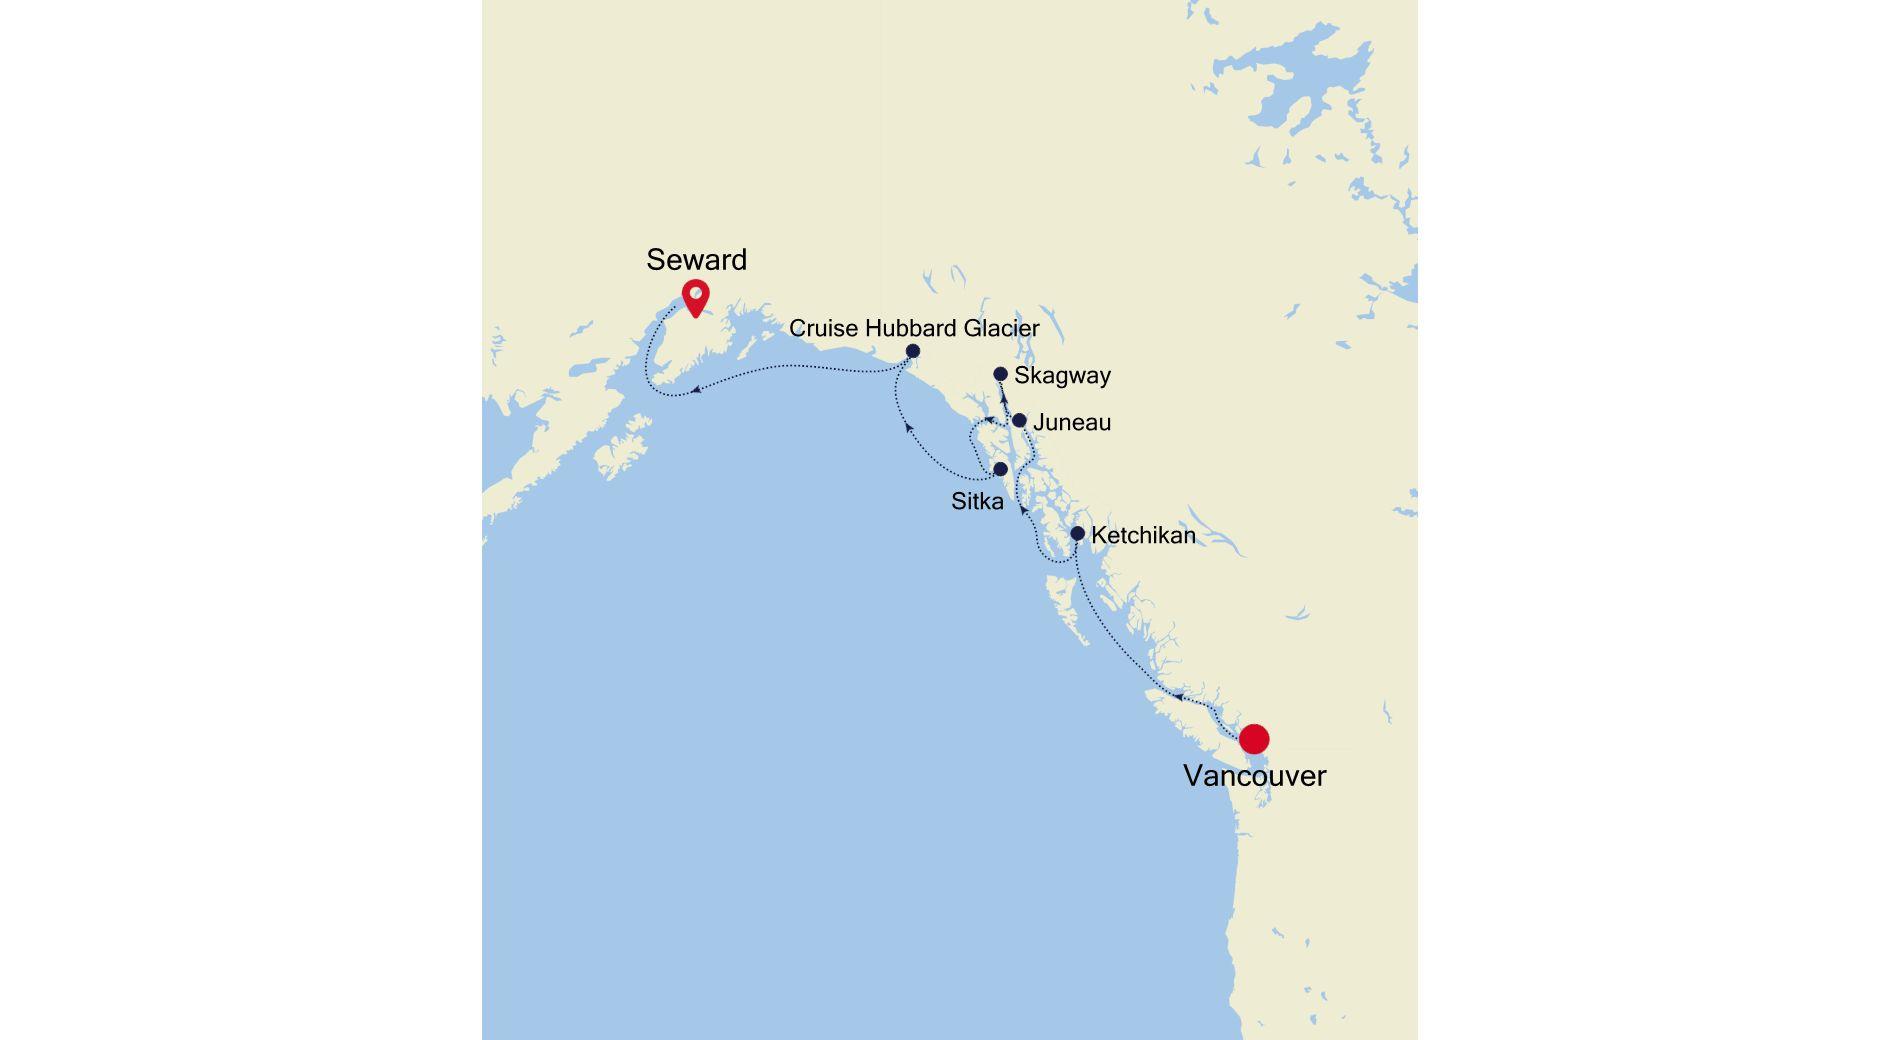 6914 - Vancouver a Seward